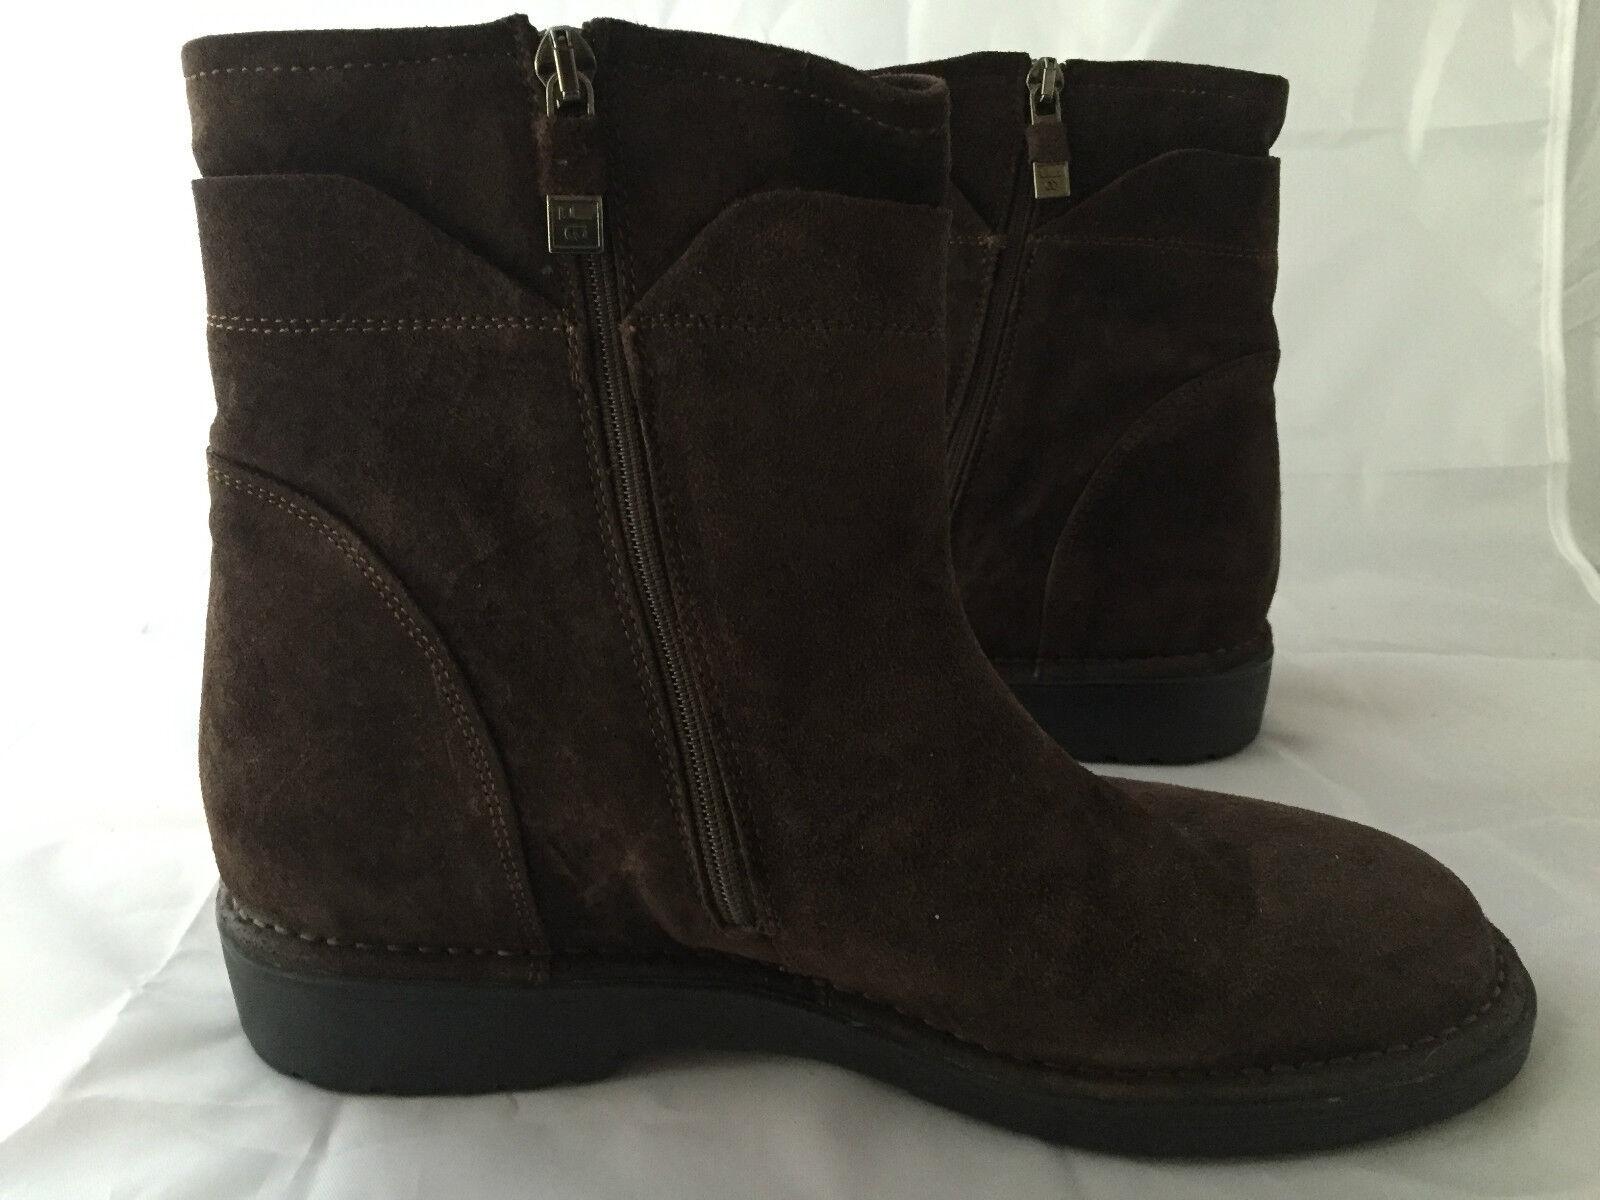 NEW Alberto Fermani Brown Suede Ankle Boot, 2 Zips, Women Size 39 (9 US), 525